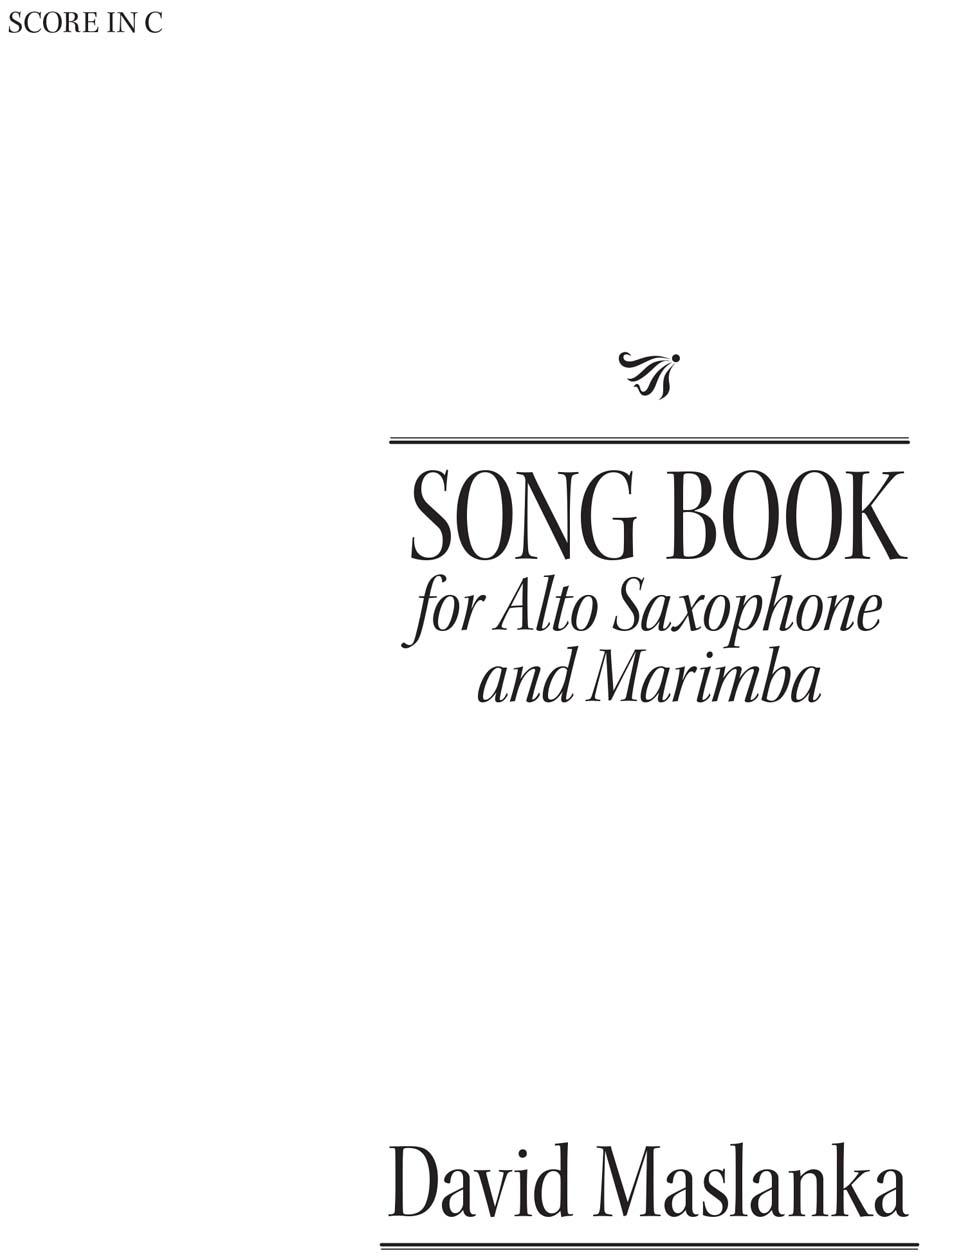 SongBook(1998)para saxofón alto y marimba. David Maslanka